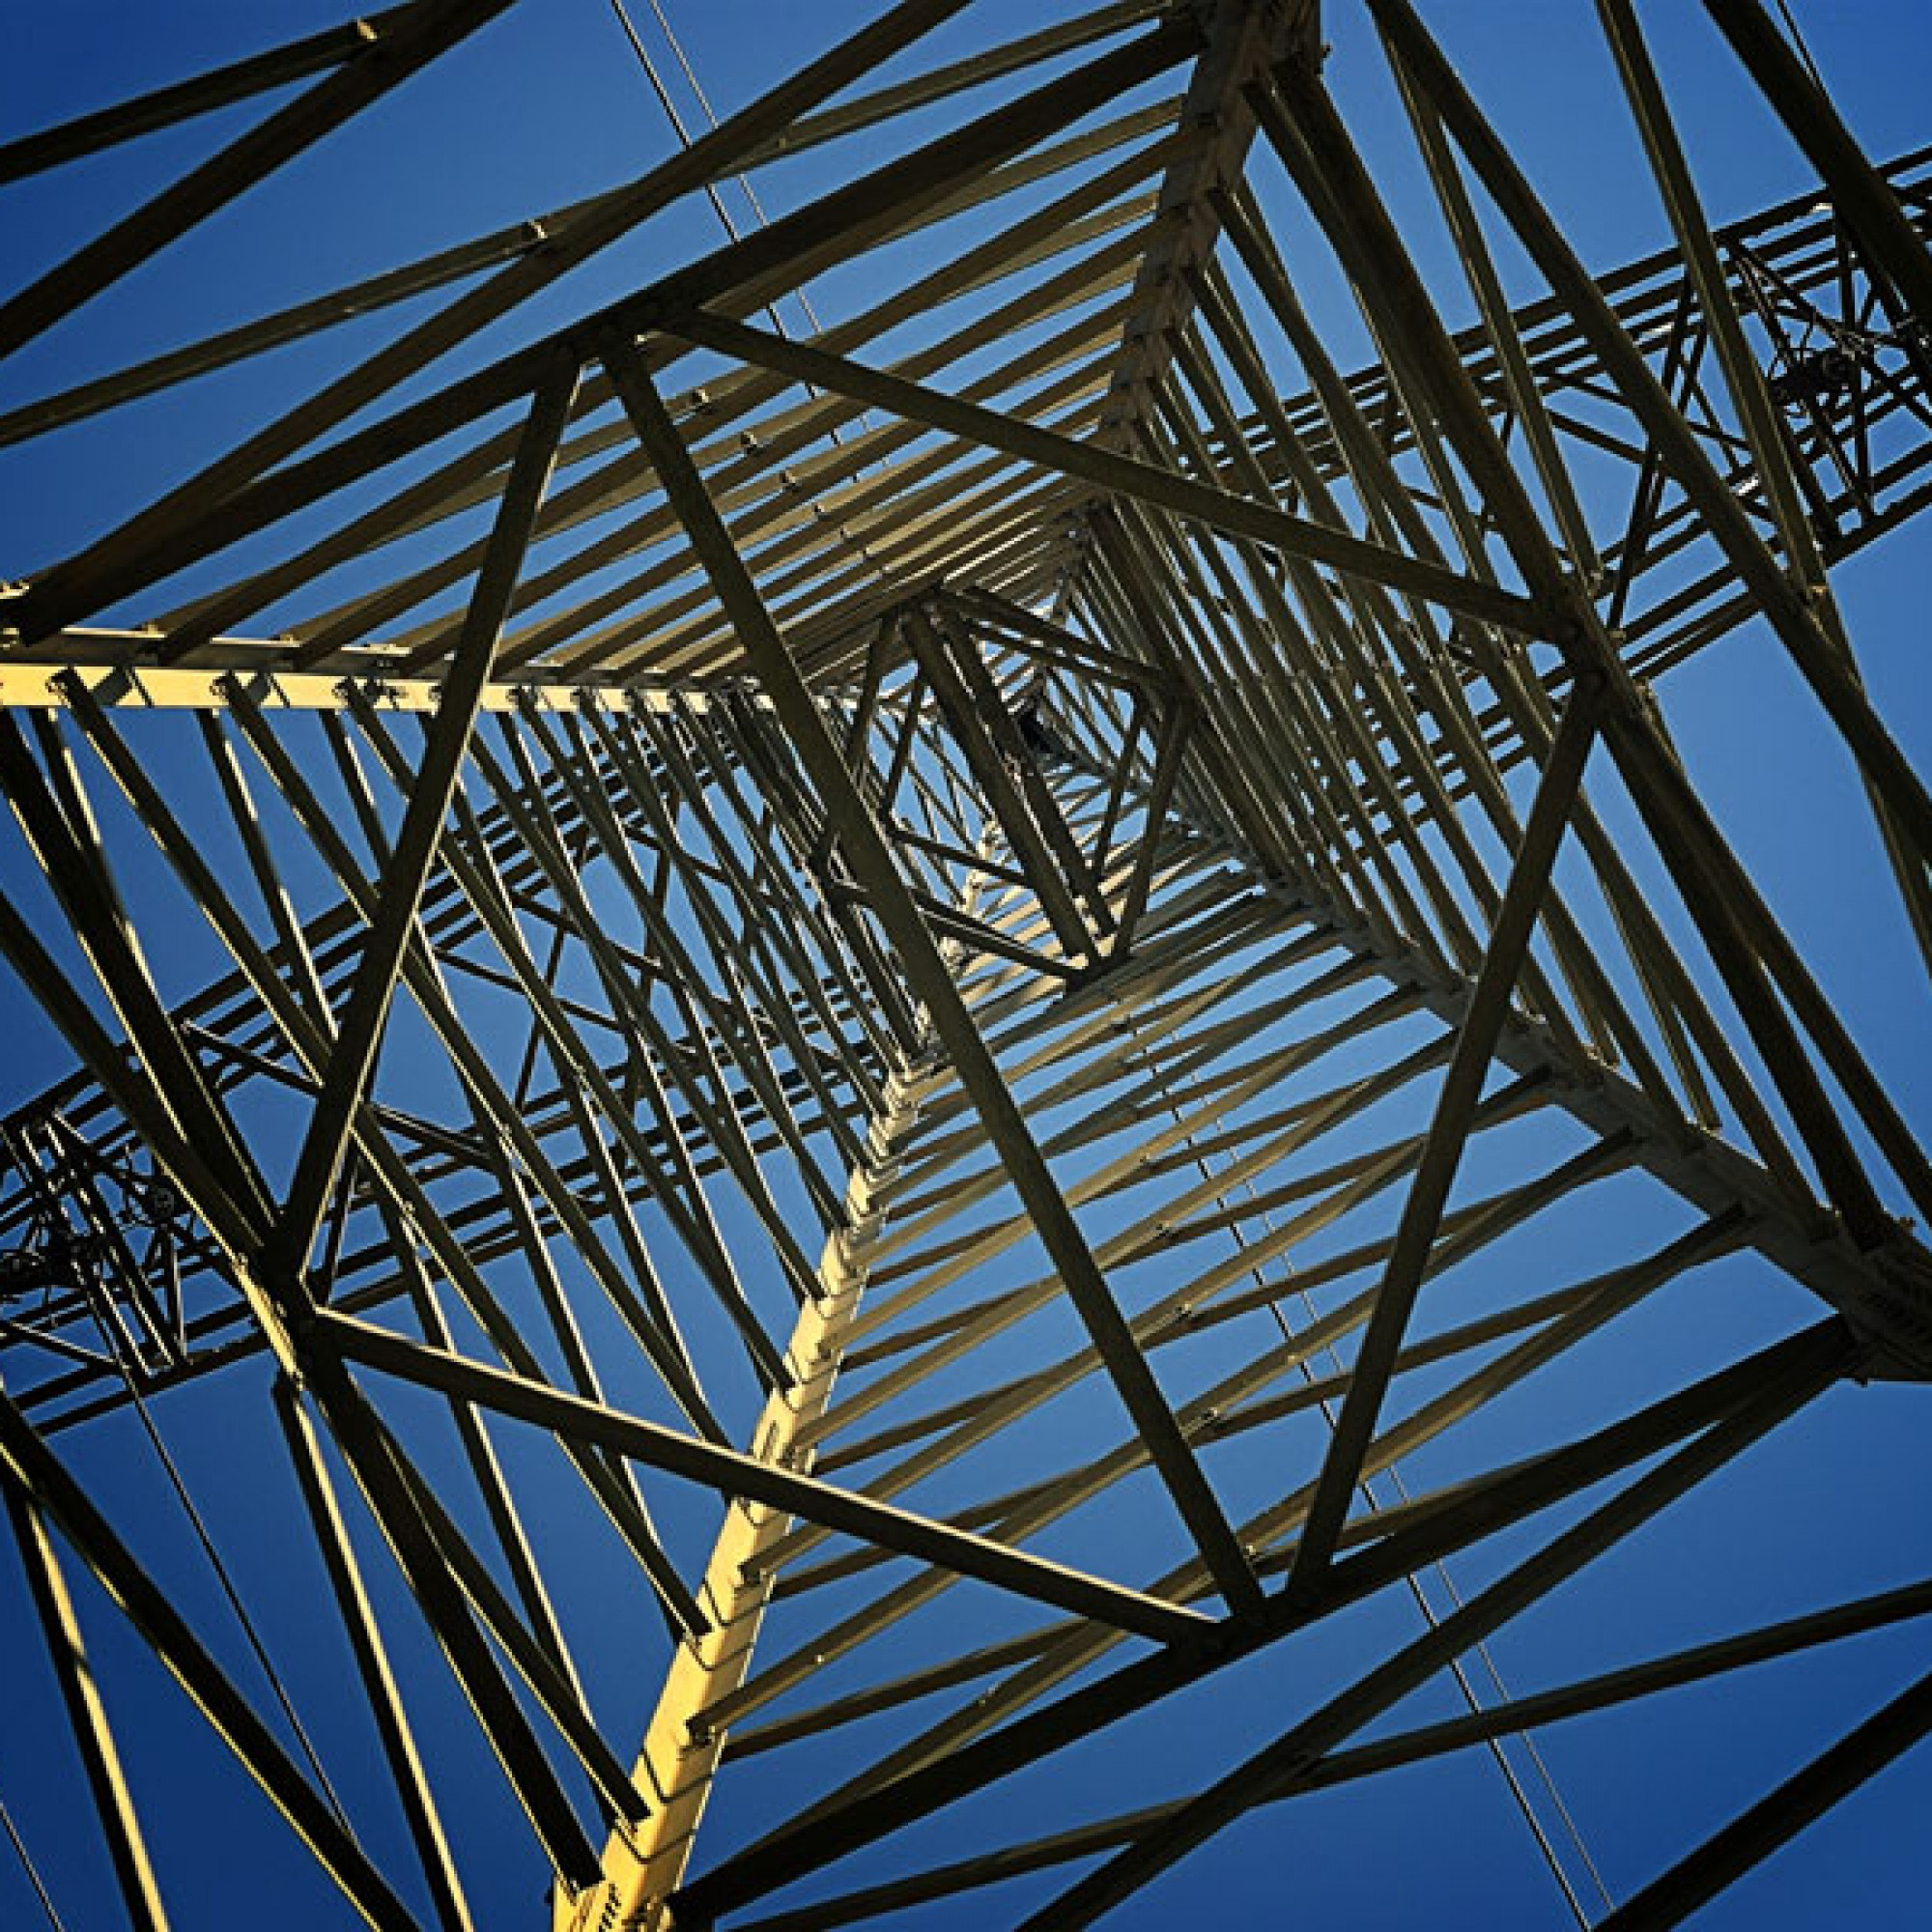 Strommast, Symbolbild (ekkiPics, flickr, CC)